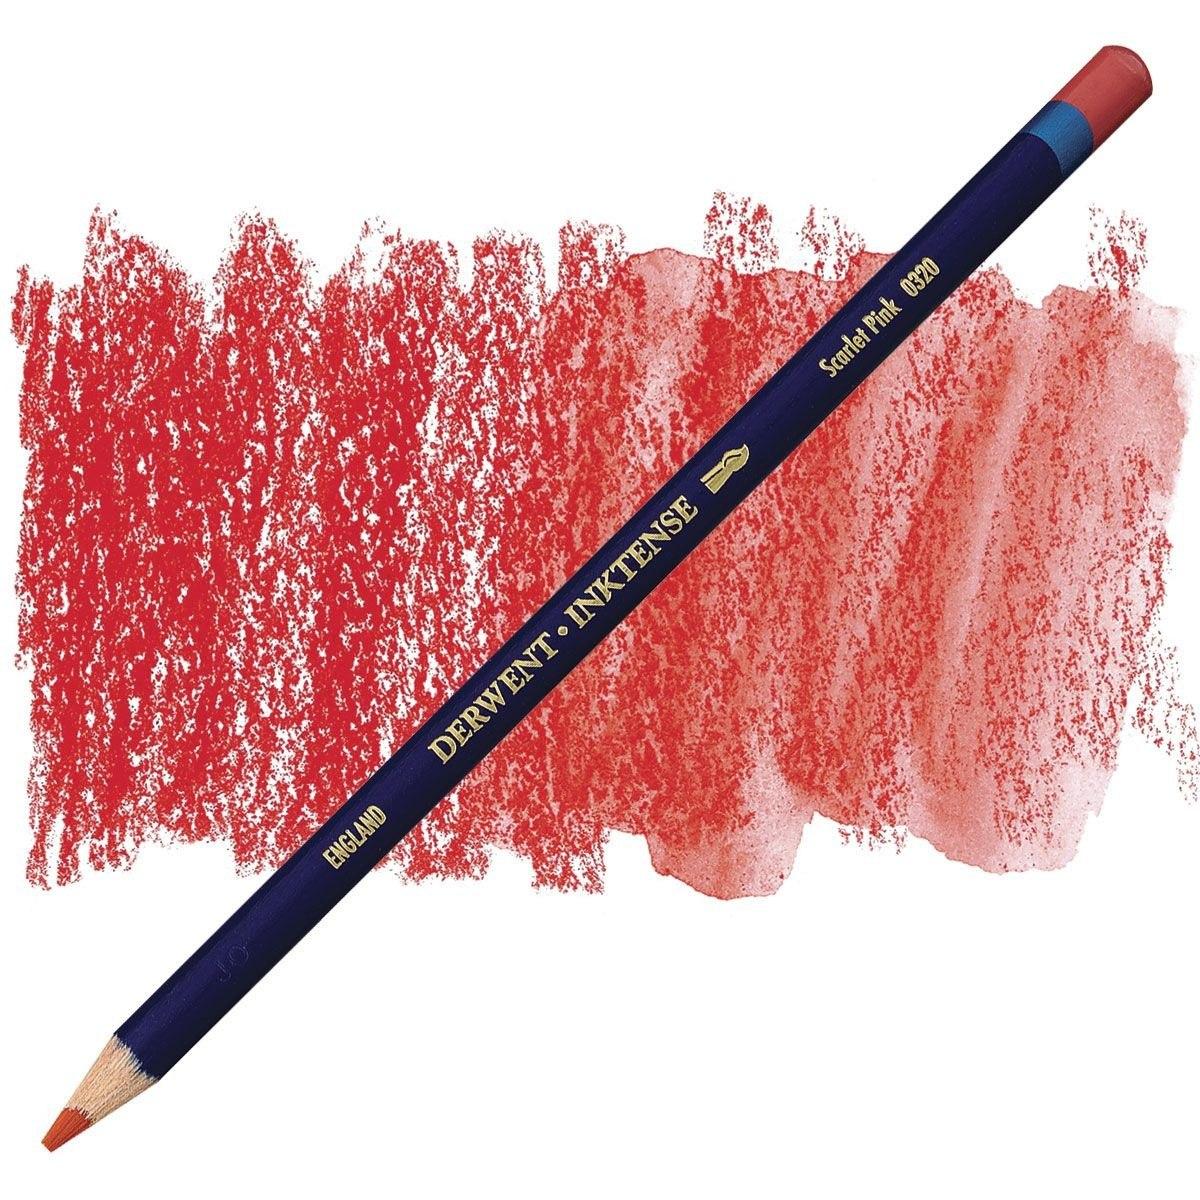 /0530/Inktense/ /L/ápices de color rojo Derwent/